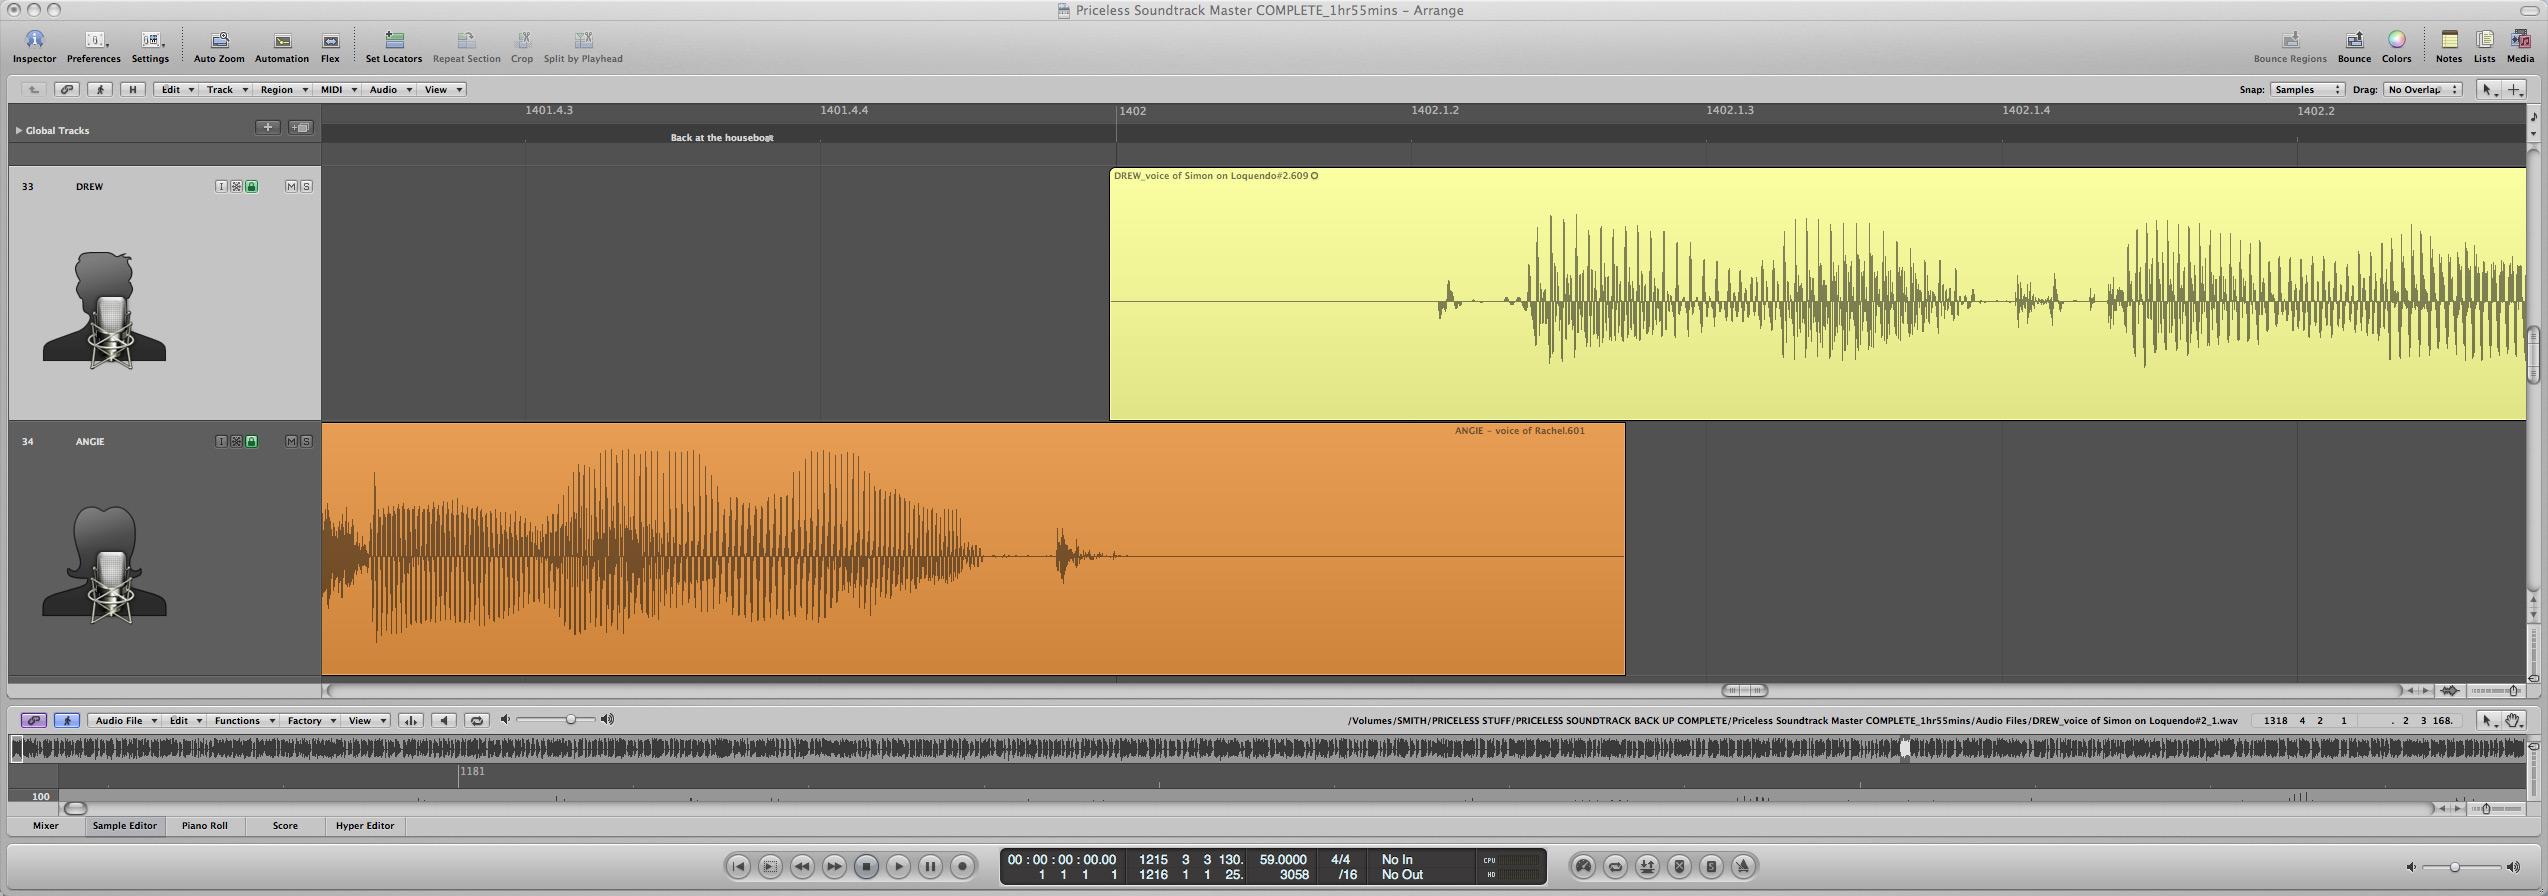 sound_module_close_up